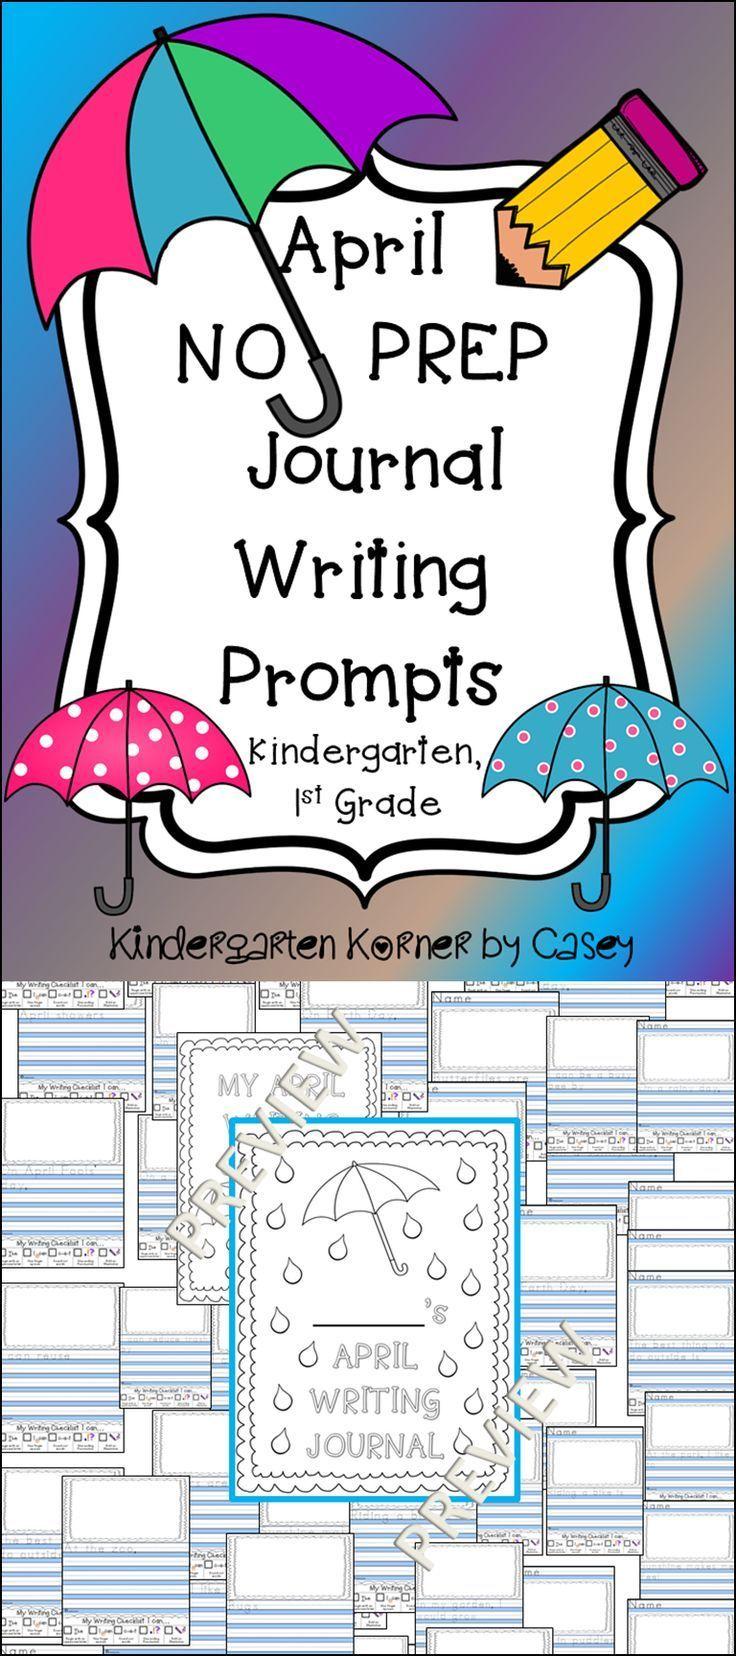 April no prep journal writing promptskindergarten 1st